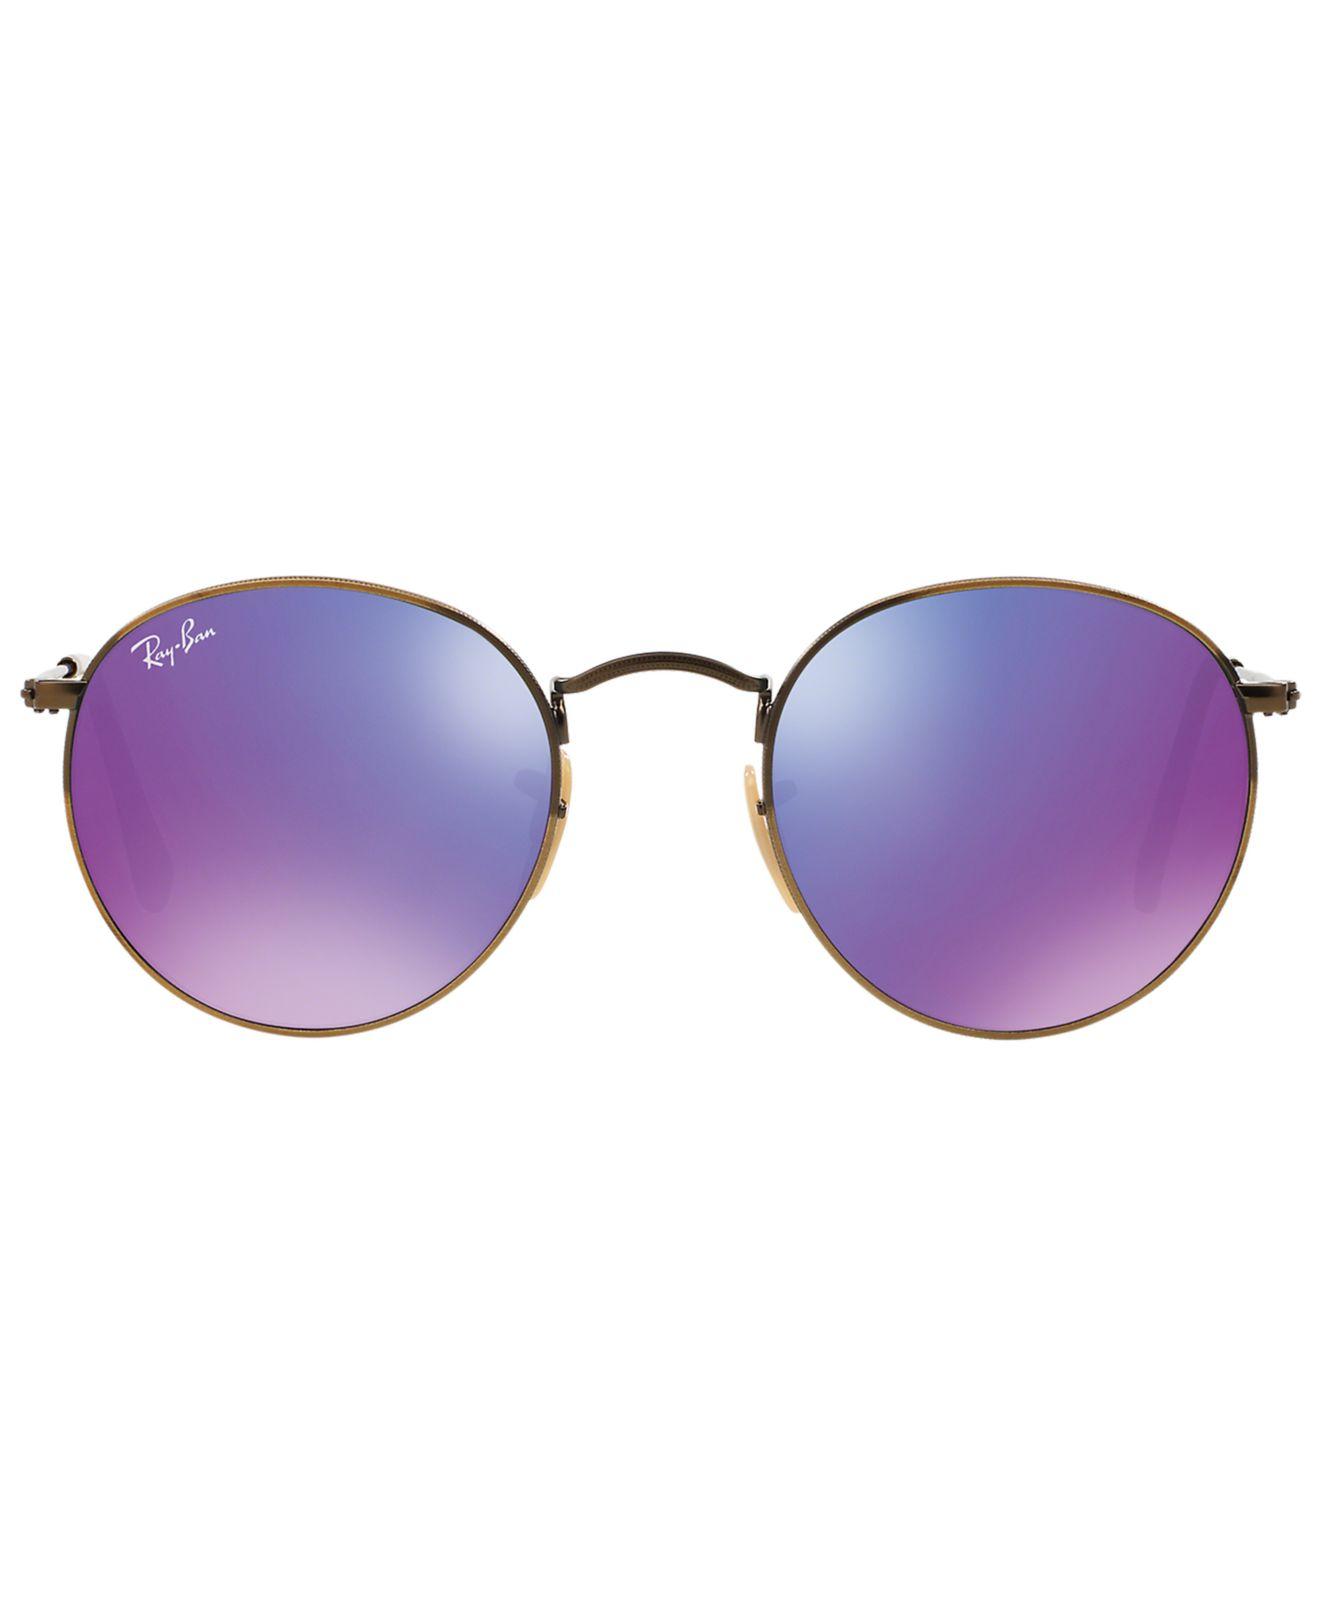 f12e2060beb discount ray ban sunglasses round rock texas where to buy ray ban ...